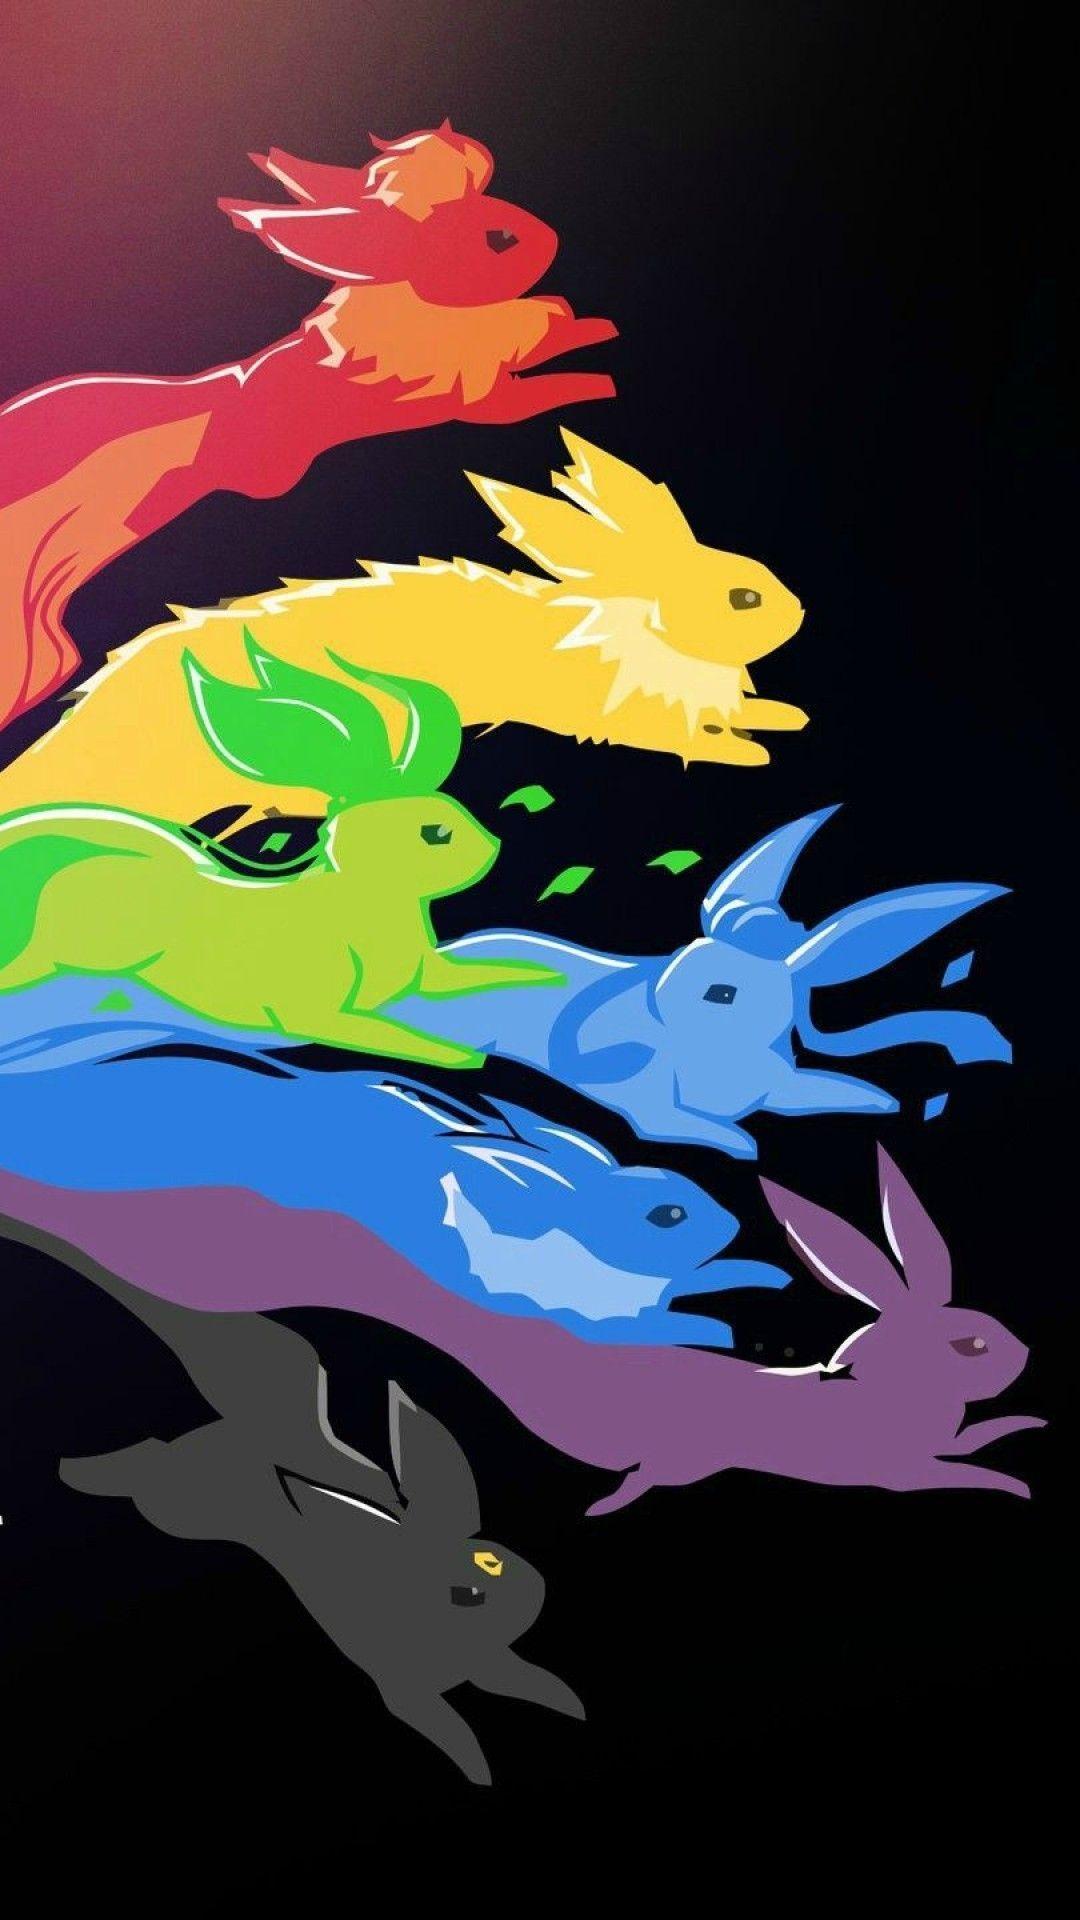 Pokemon Phone Wallpapers Top Free Pokemon Phone Backgrounds Wallpaperaccess